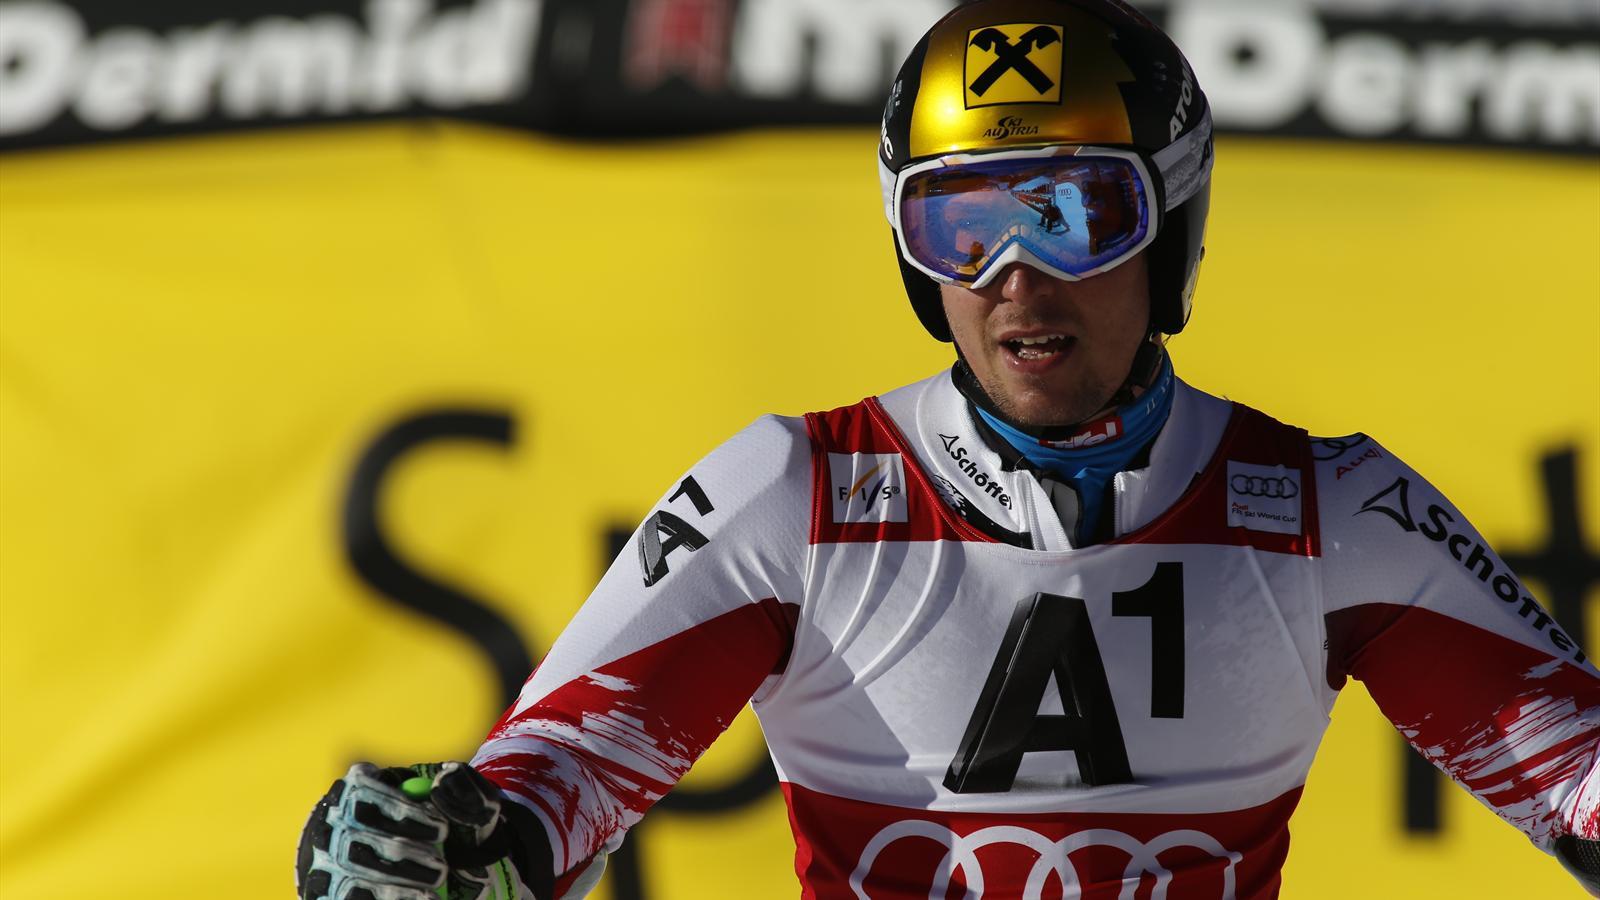 Coupe du monde alta badia hirscher et jansrud toi et - Coupe du monde ski alpin 2015 calendrier ...